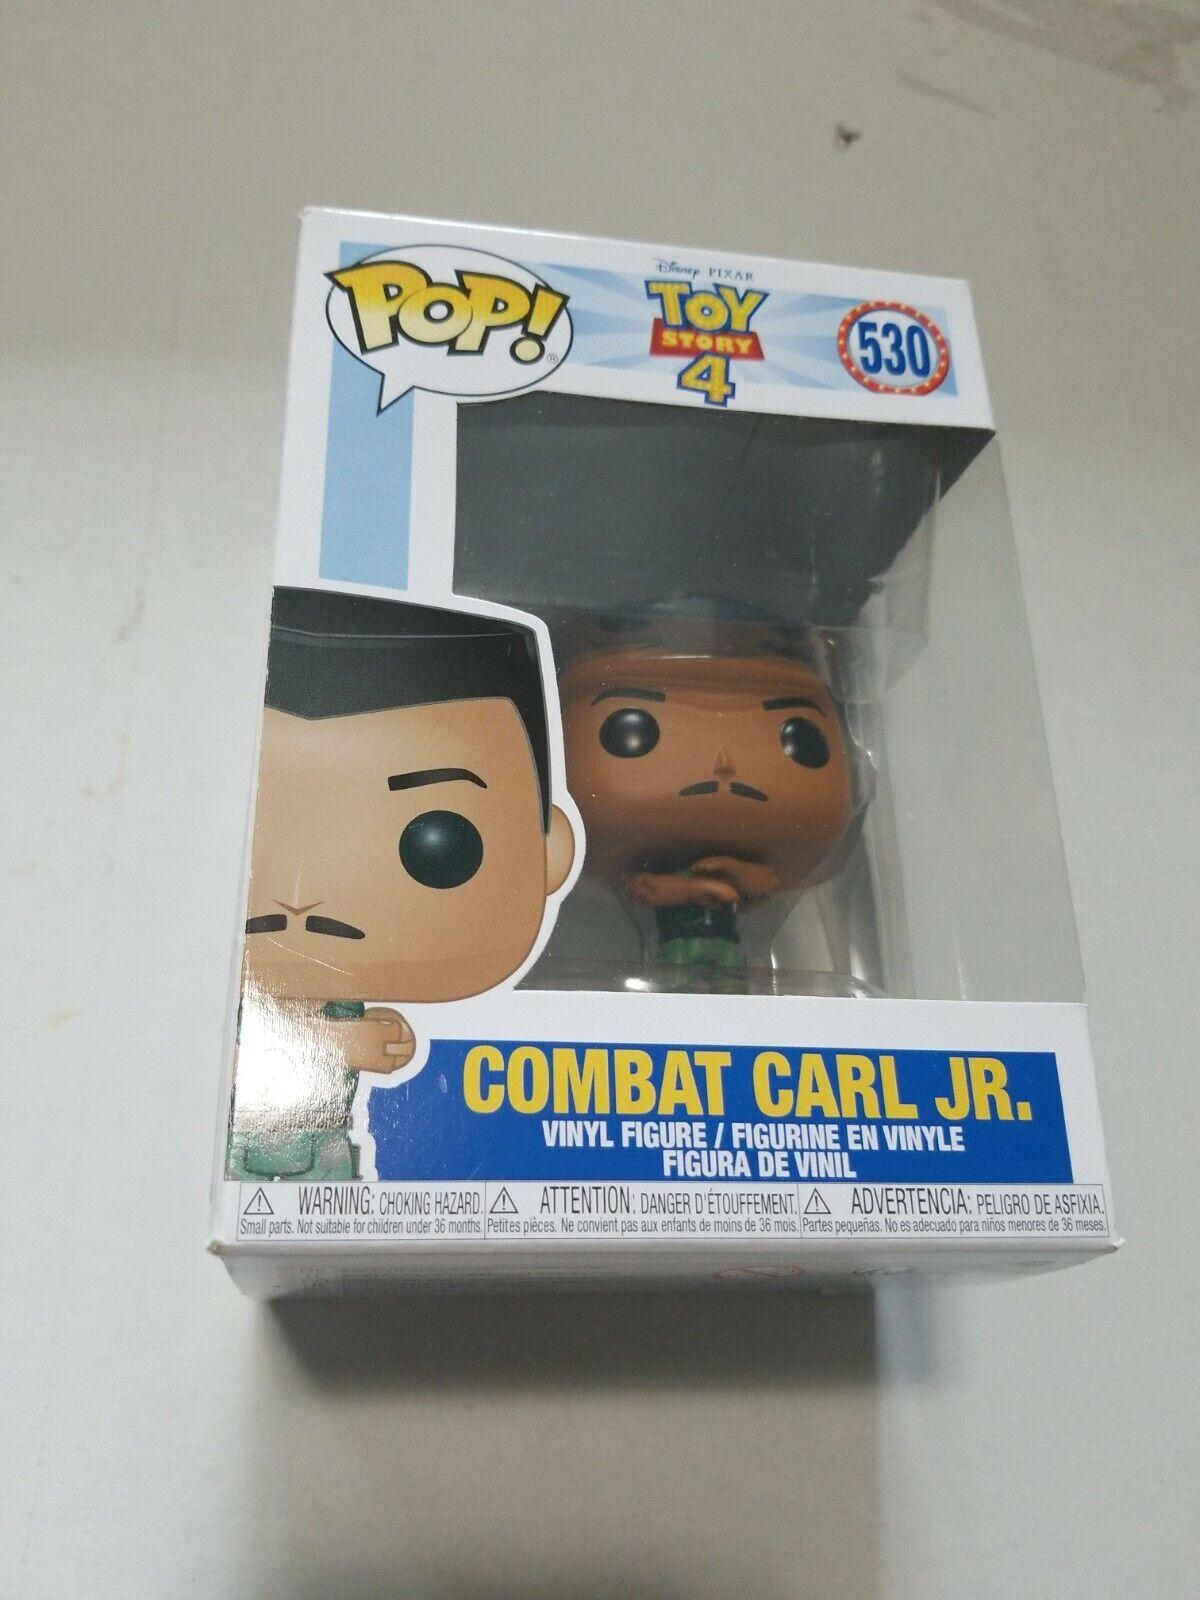 VINYL FIGURE #530 DISNEY:TOY STORY 4 FUNKO POP COMBAT CARL JR